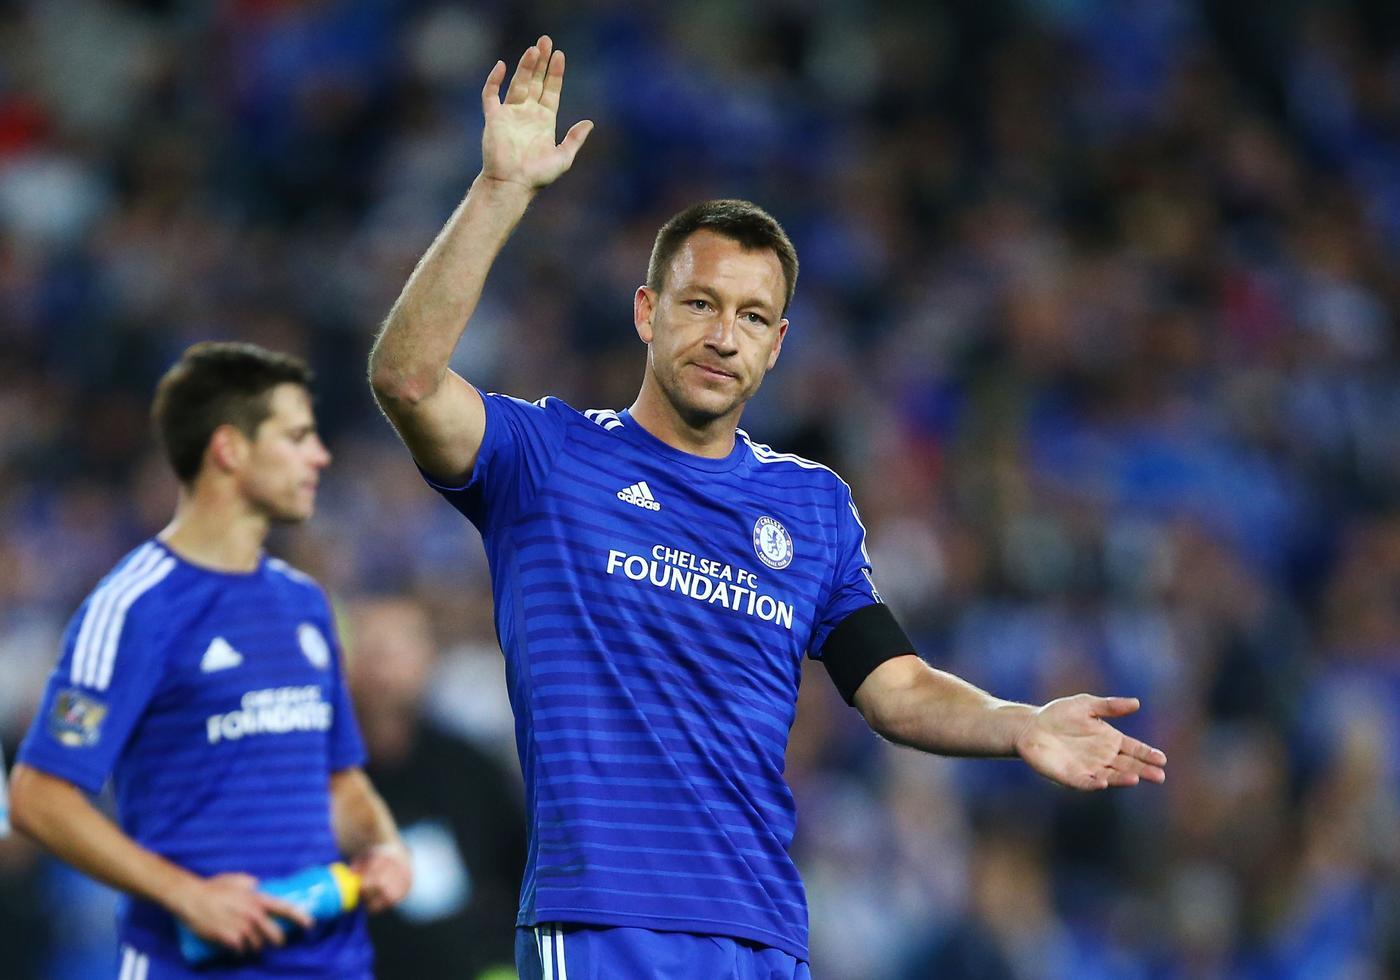 Drop Branislav Ivanovic? Recall John Terry? Bench Eden Hazard even? How will Jose Mourinho line up his Chelsea side v Arsenal in the Premier League?